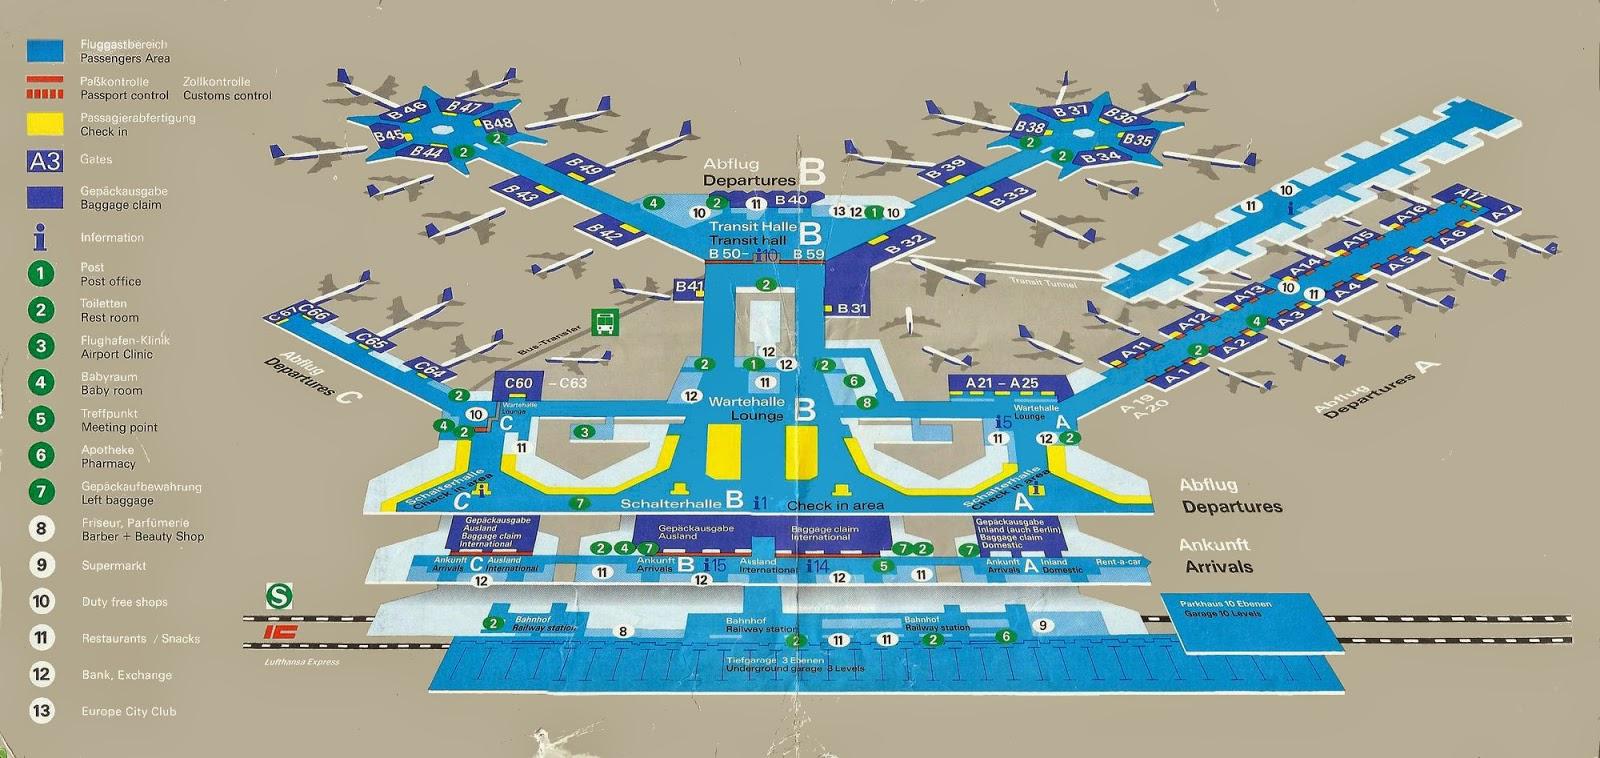 1988 frankfurt airport brochure with airport terminal maps